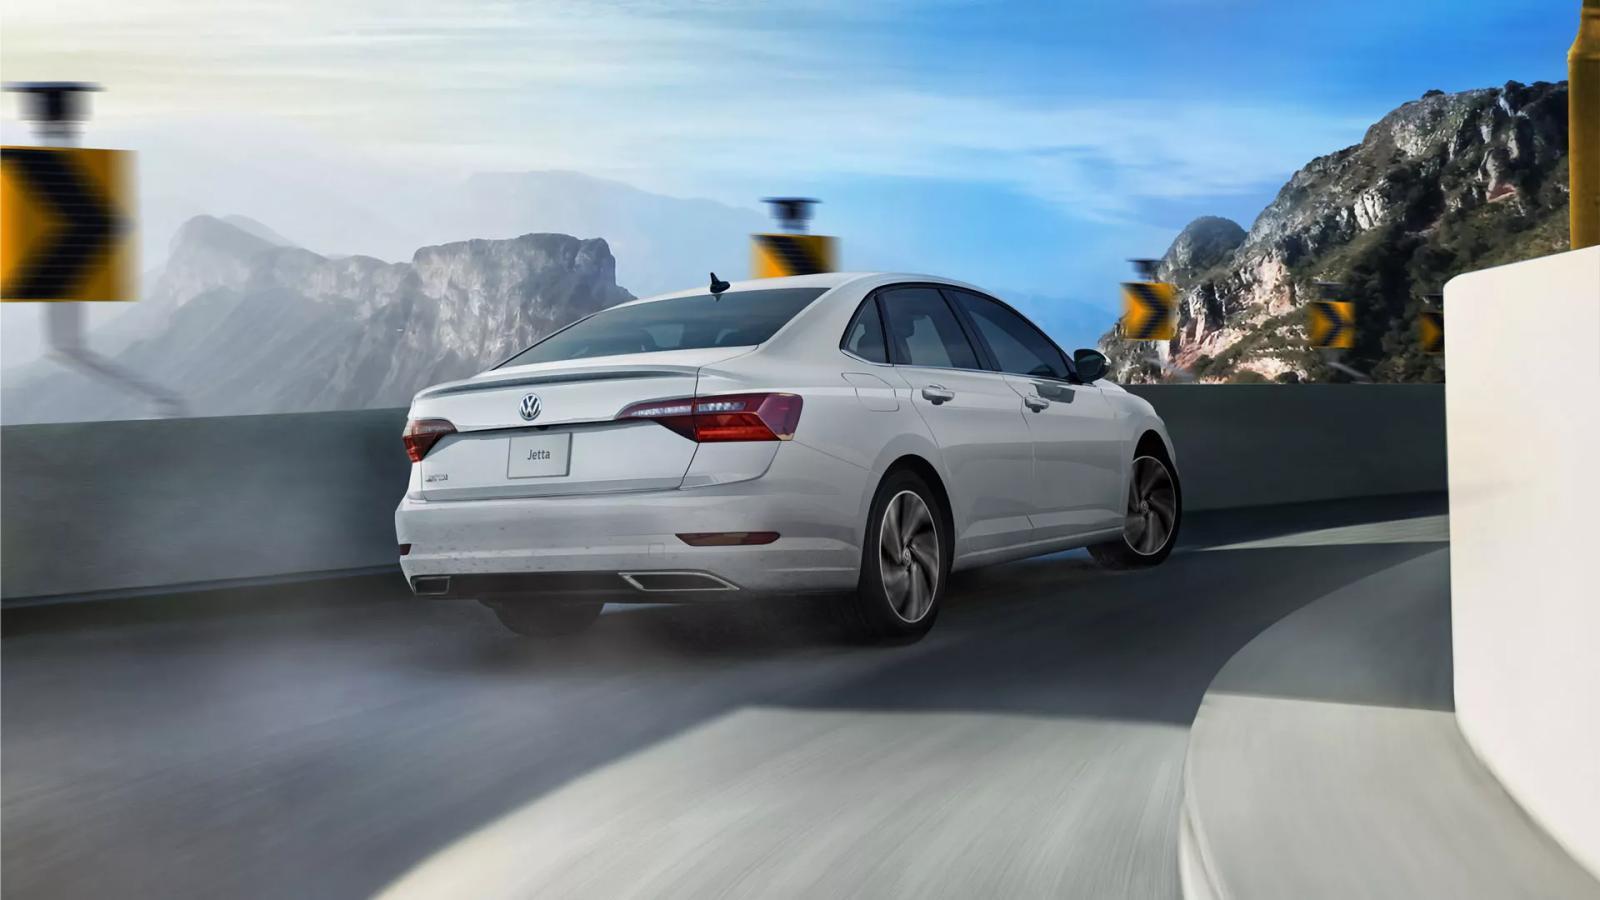 Honda Civic i-Style 2021 Volkswagen Jetta Comfortline 2021 comparativa